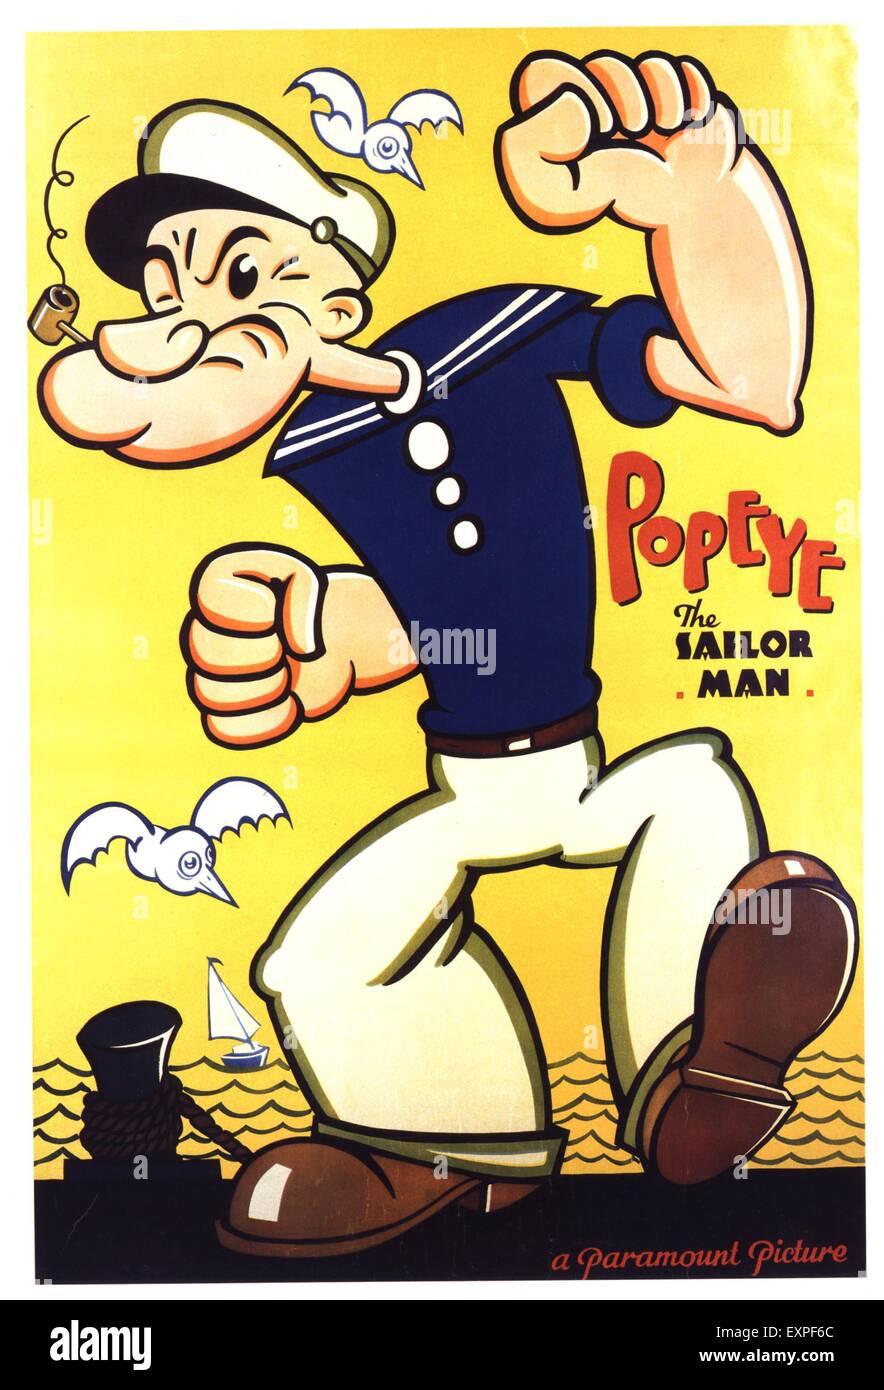 1930s UK Popeye The Sailor Man Film Poster - Stock Image